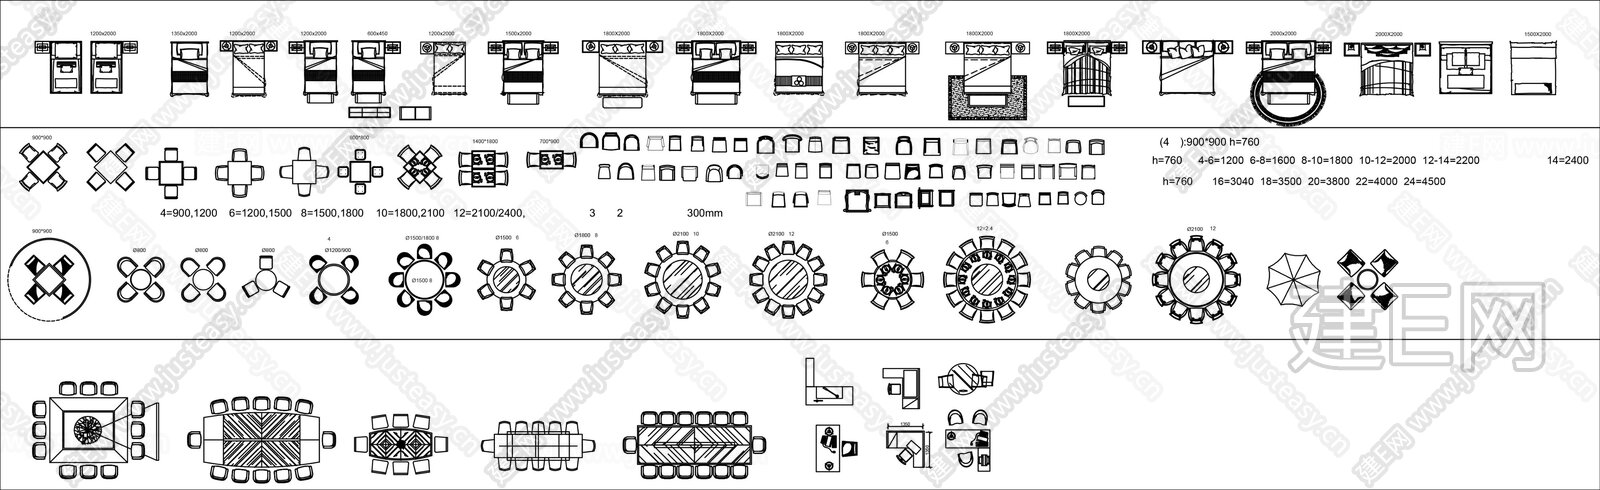 CCD家具软装|CAD施工图